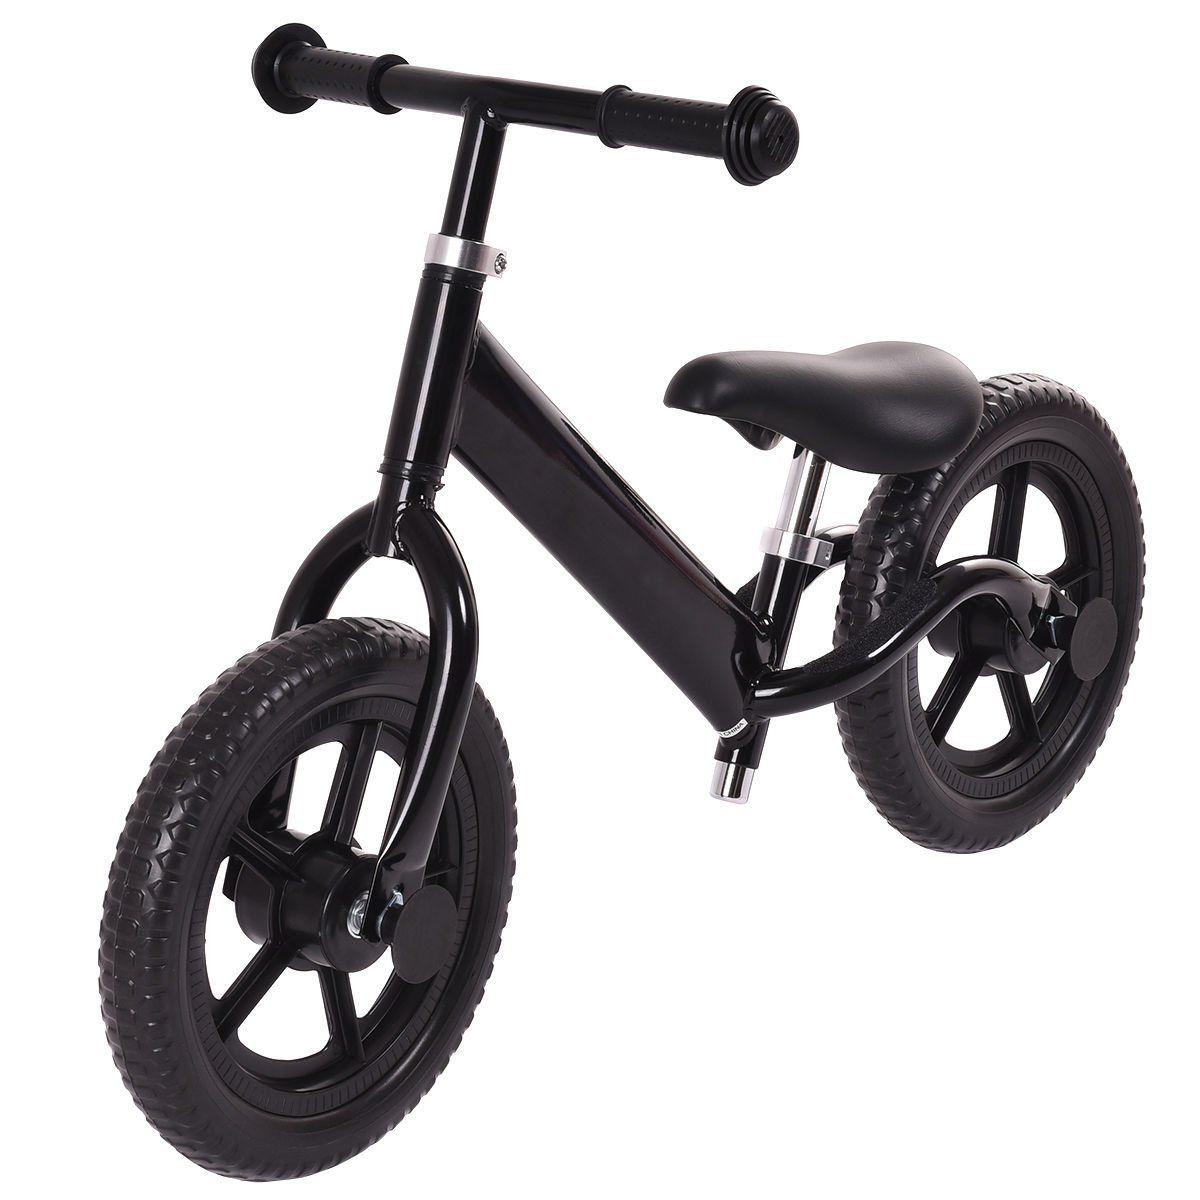 Top 10 Best Balance Bikes For Kid Reviews In 2018 Balance Bike